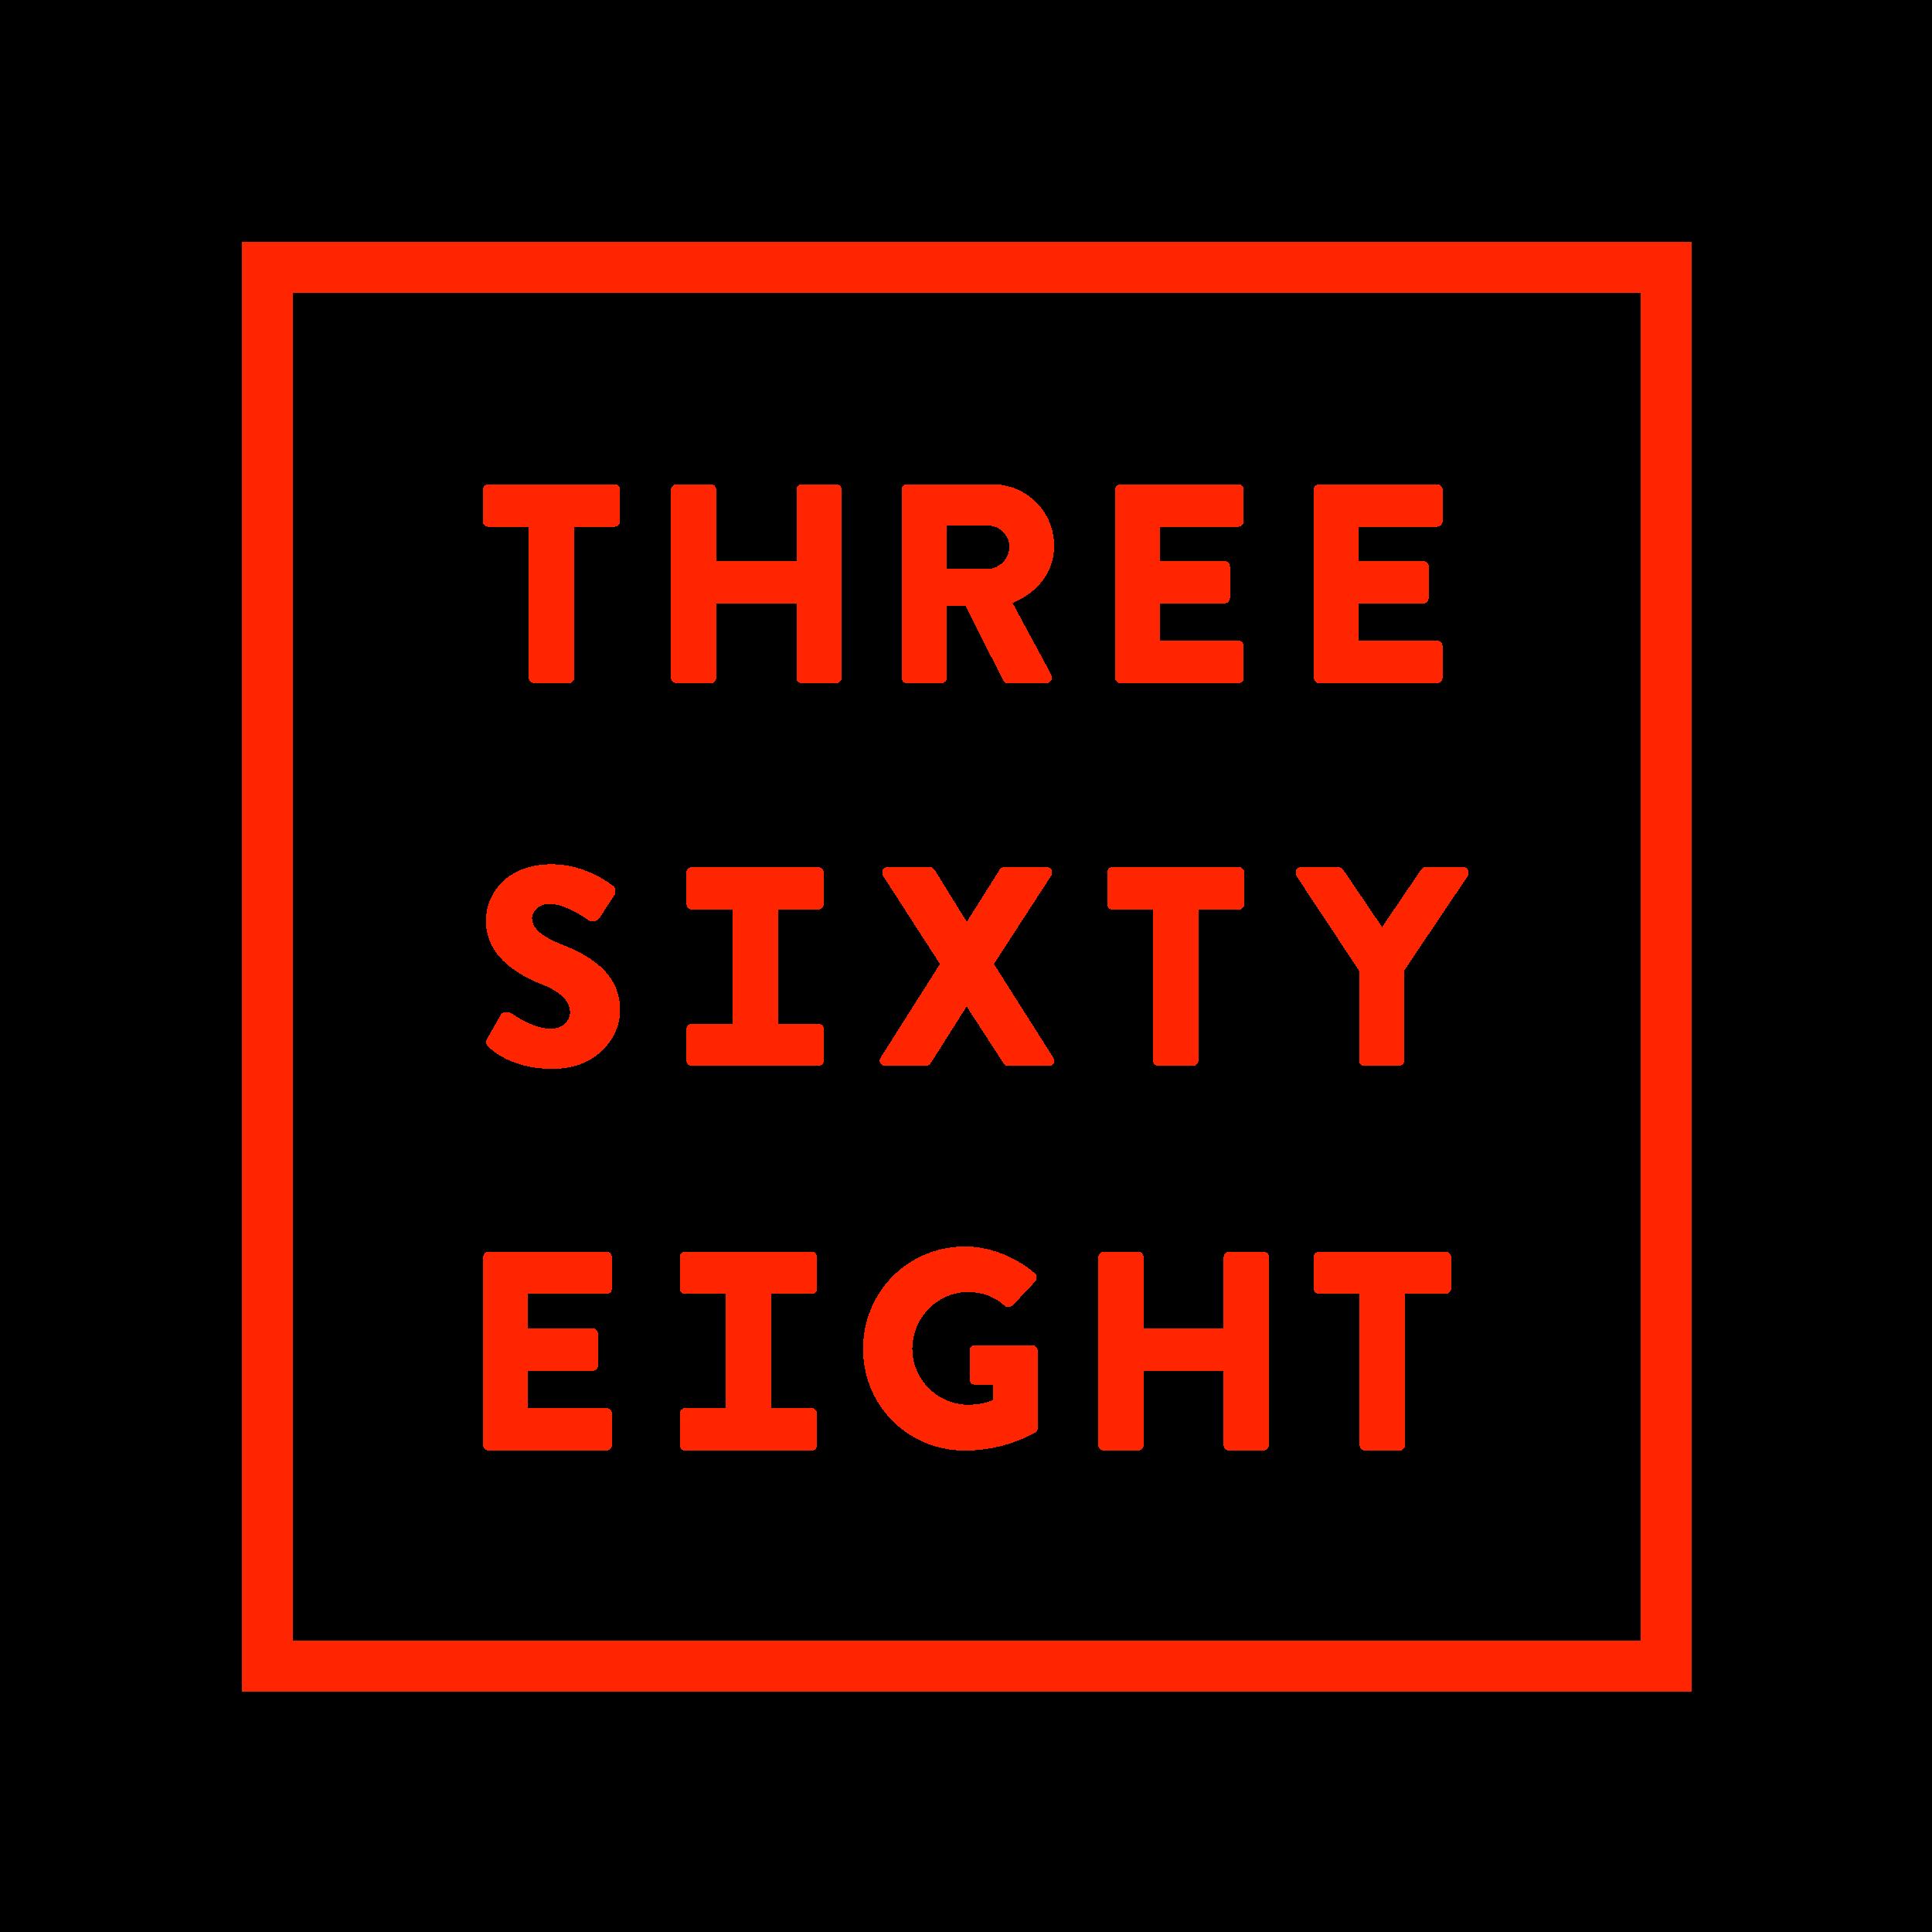 Three Sixty Eight